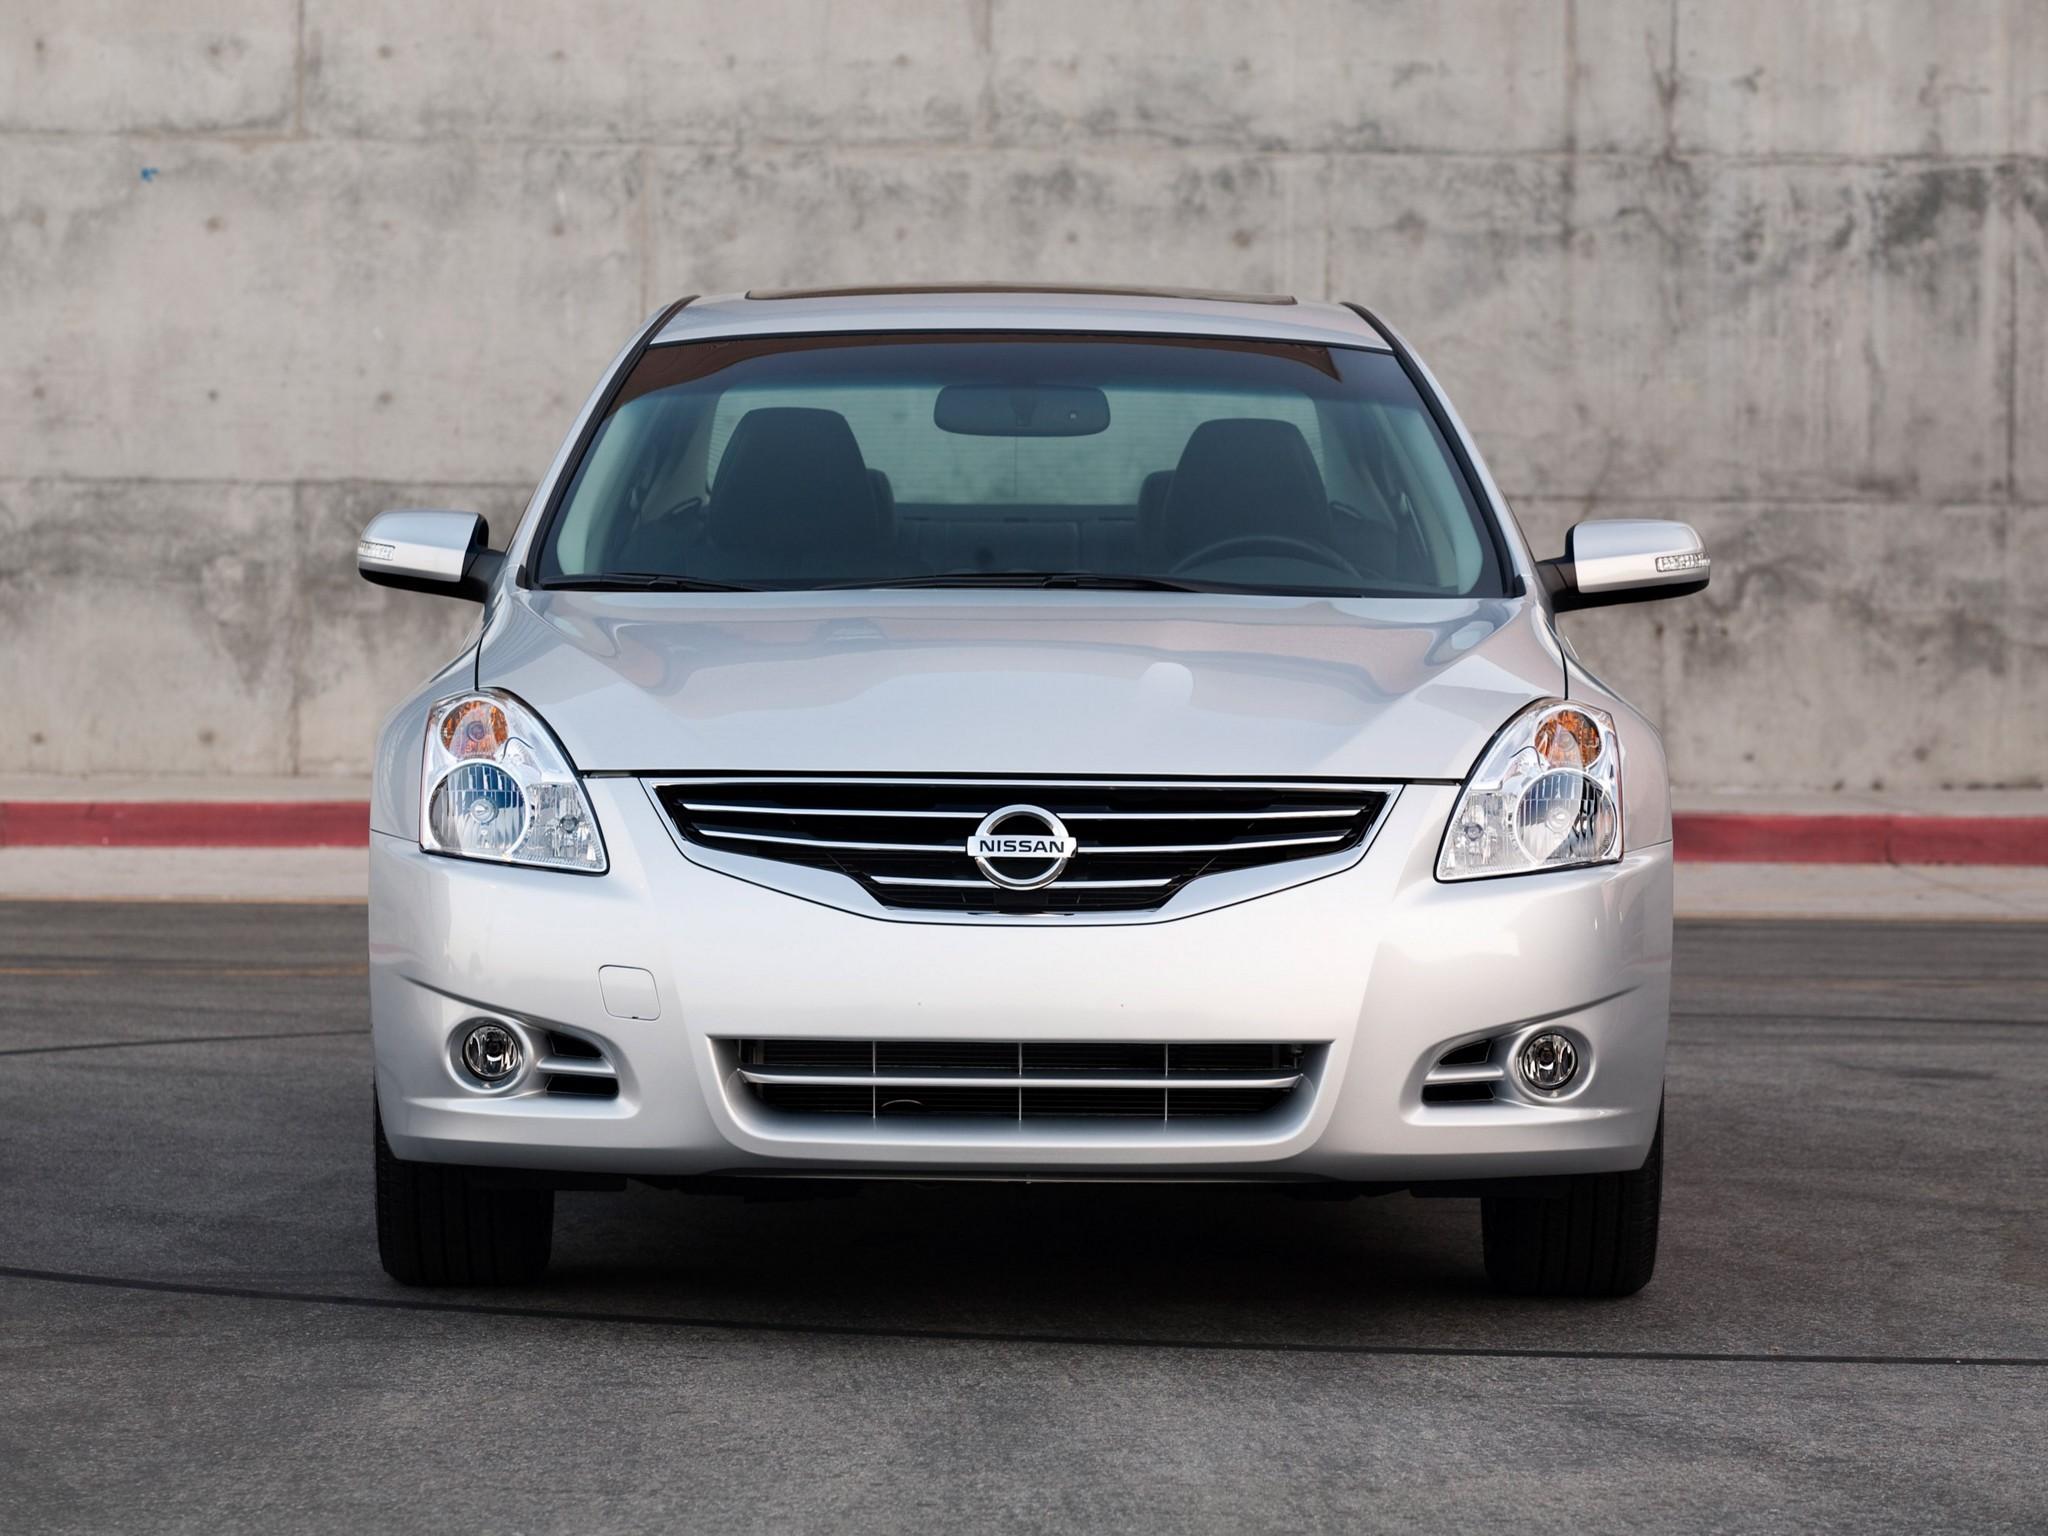 altima nissan sedan 2007 front autoevolution specs 2008 2009 motor